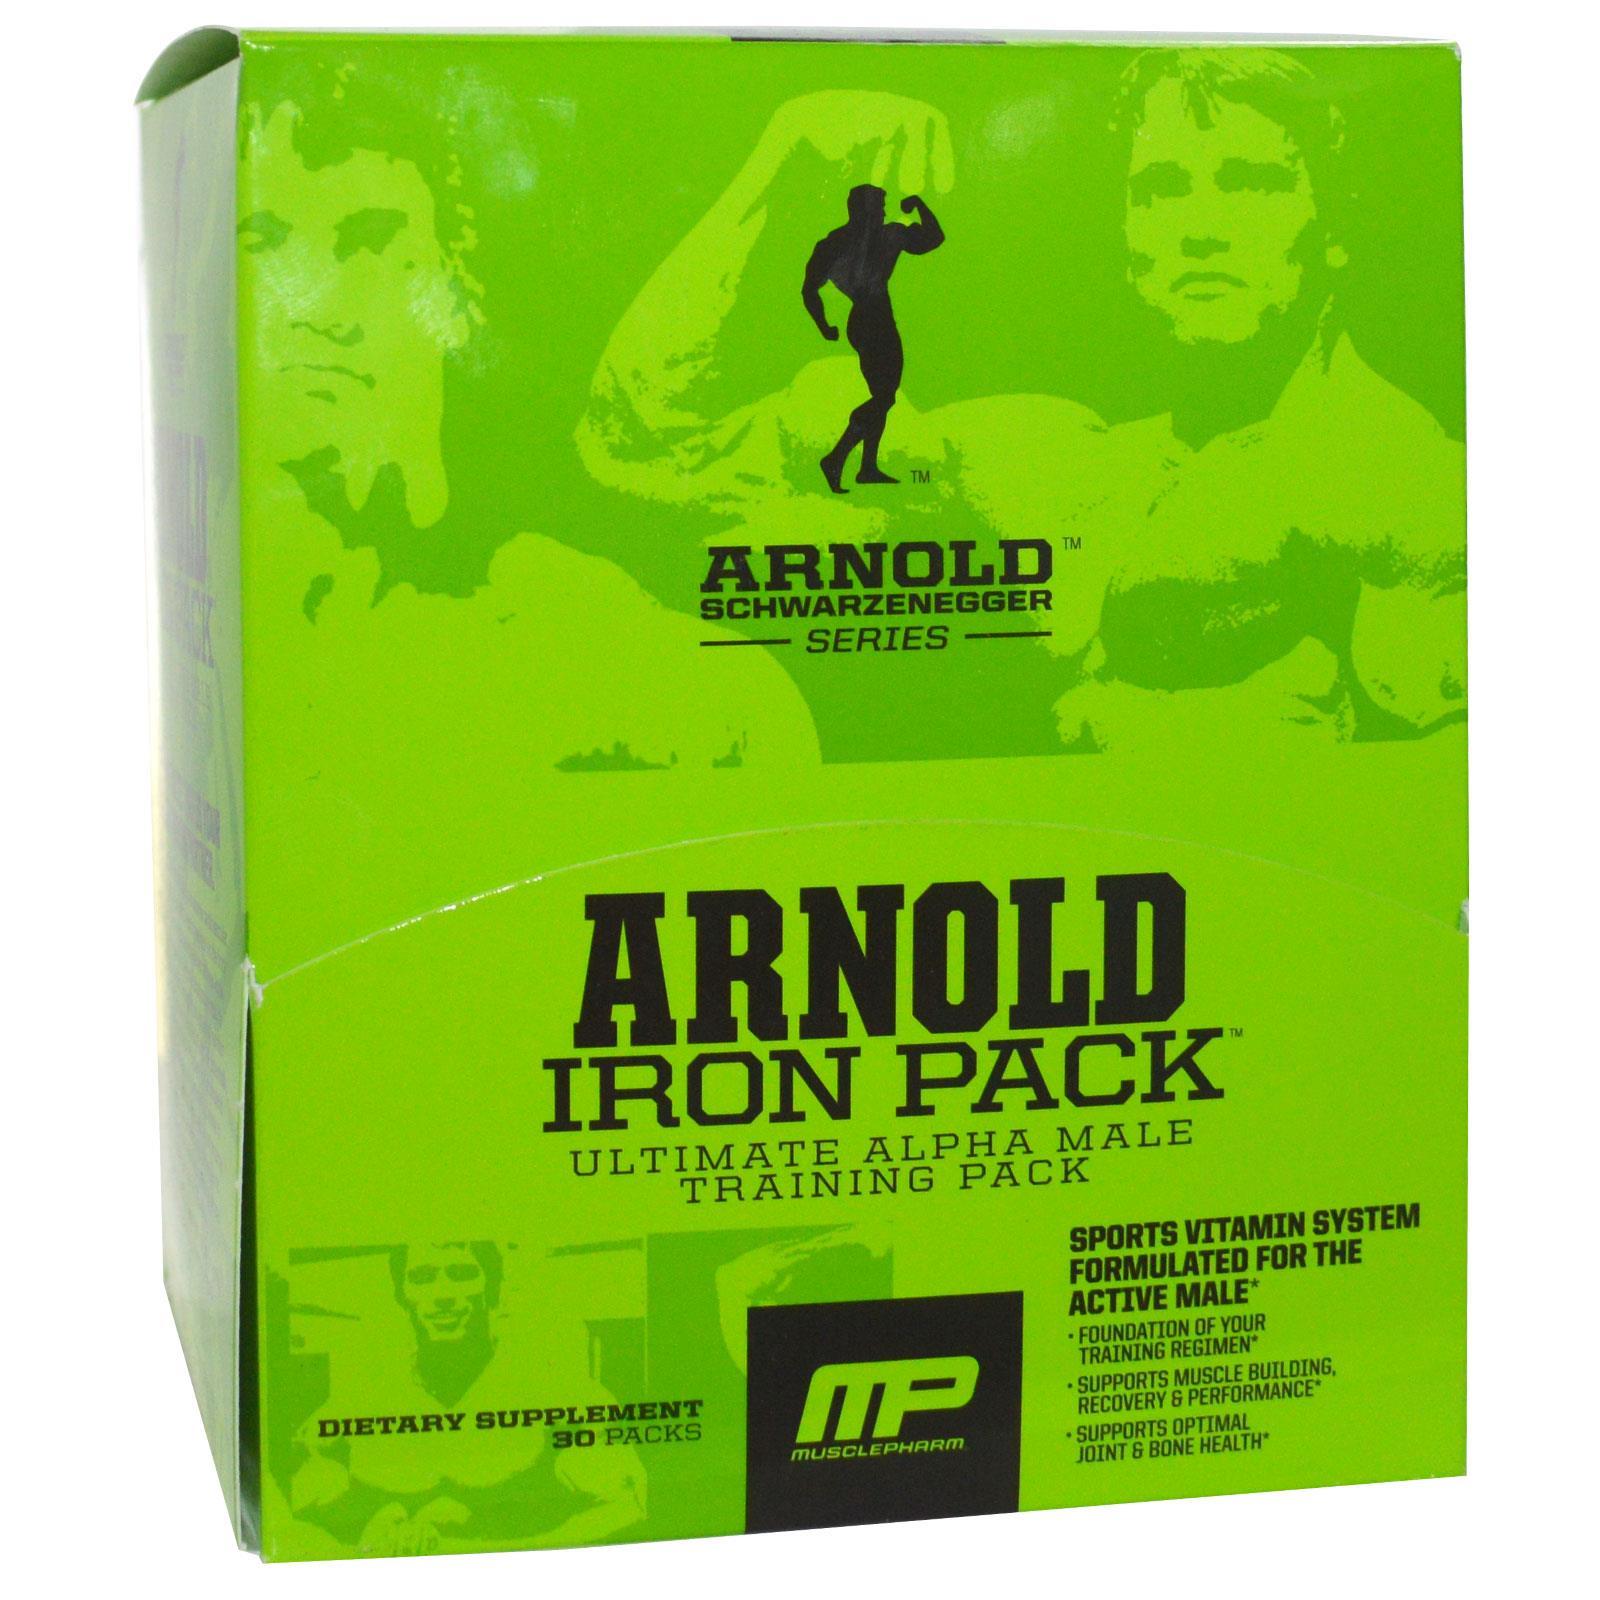 Arnold Schwarzenegger Series Iron Pack